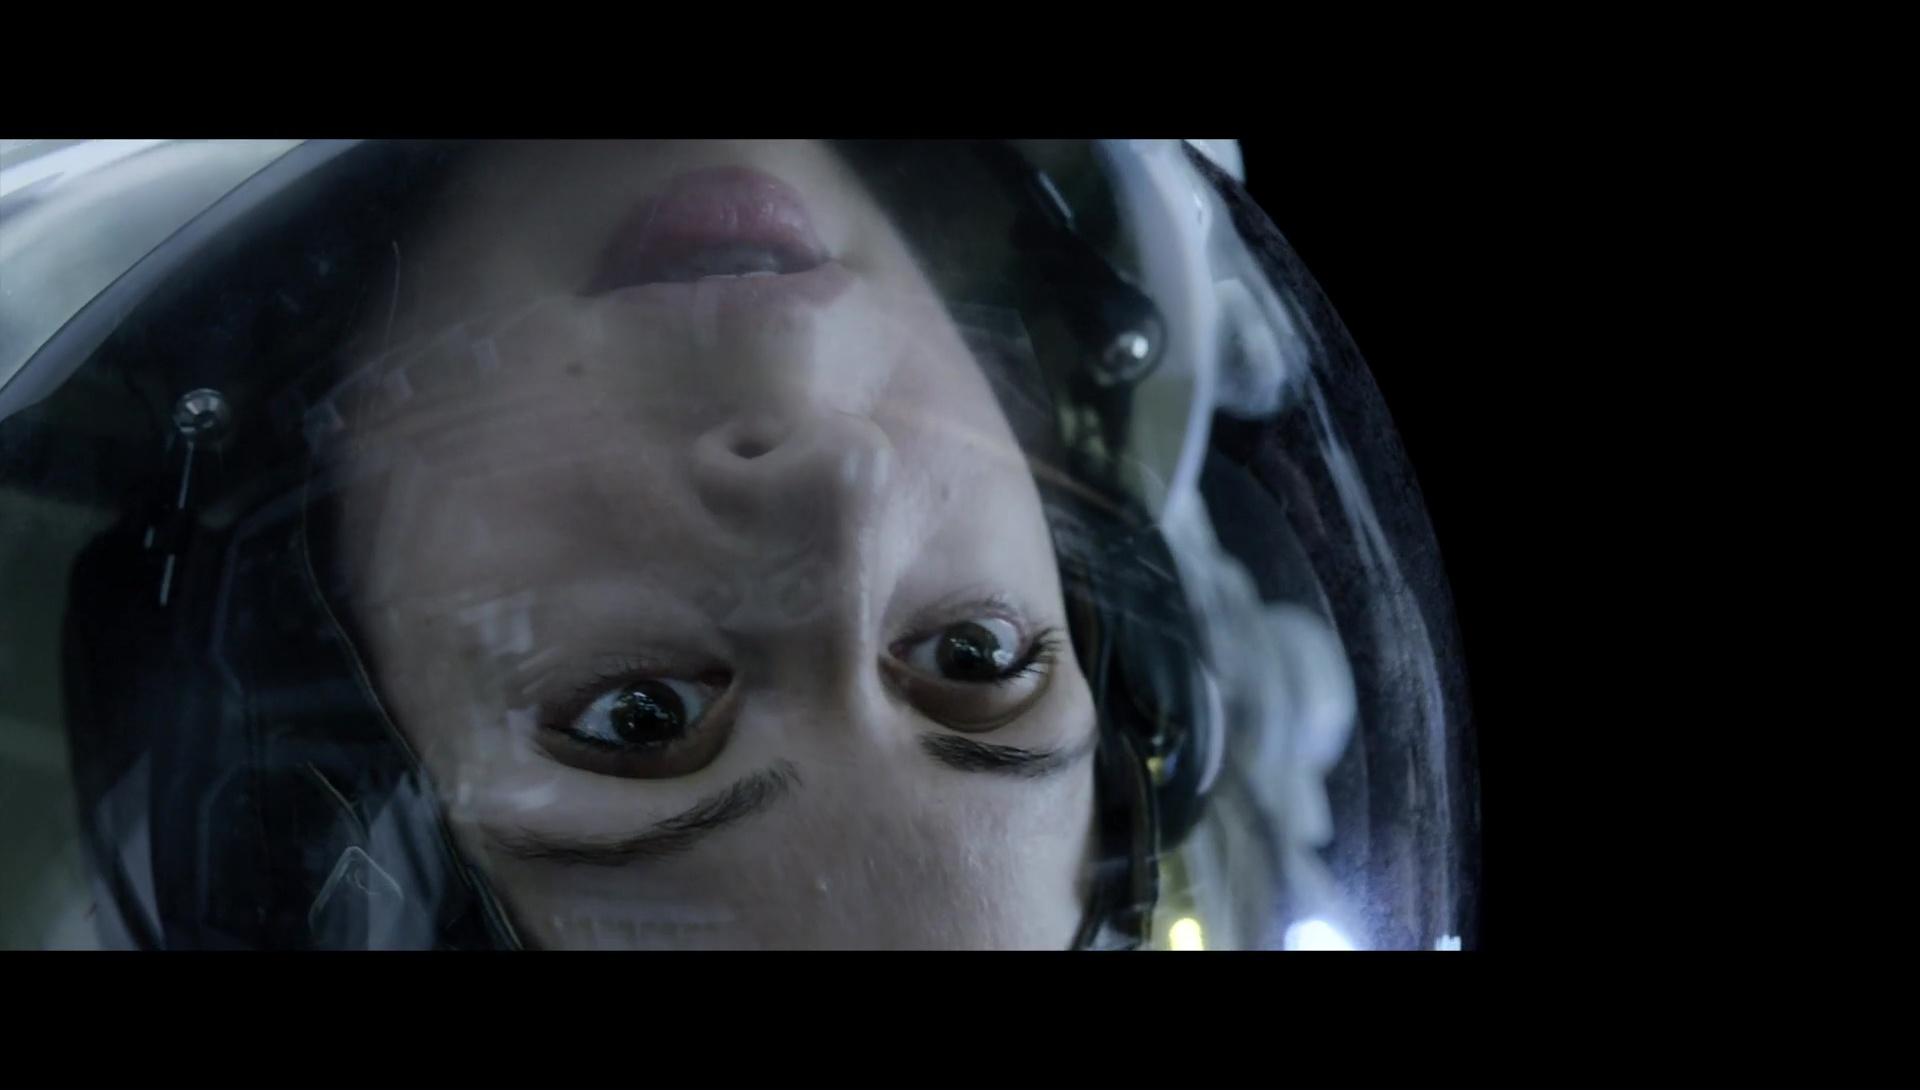 Life Vida Inteligente 1080p Lat-Cast-Ing 5.1 (2017)